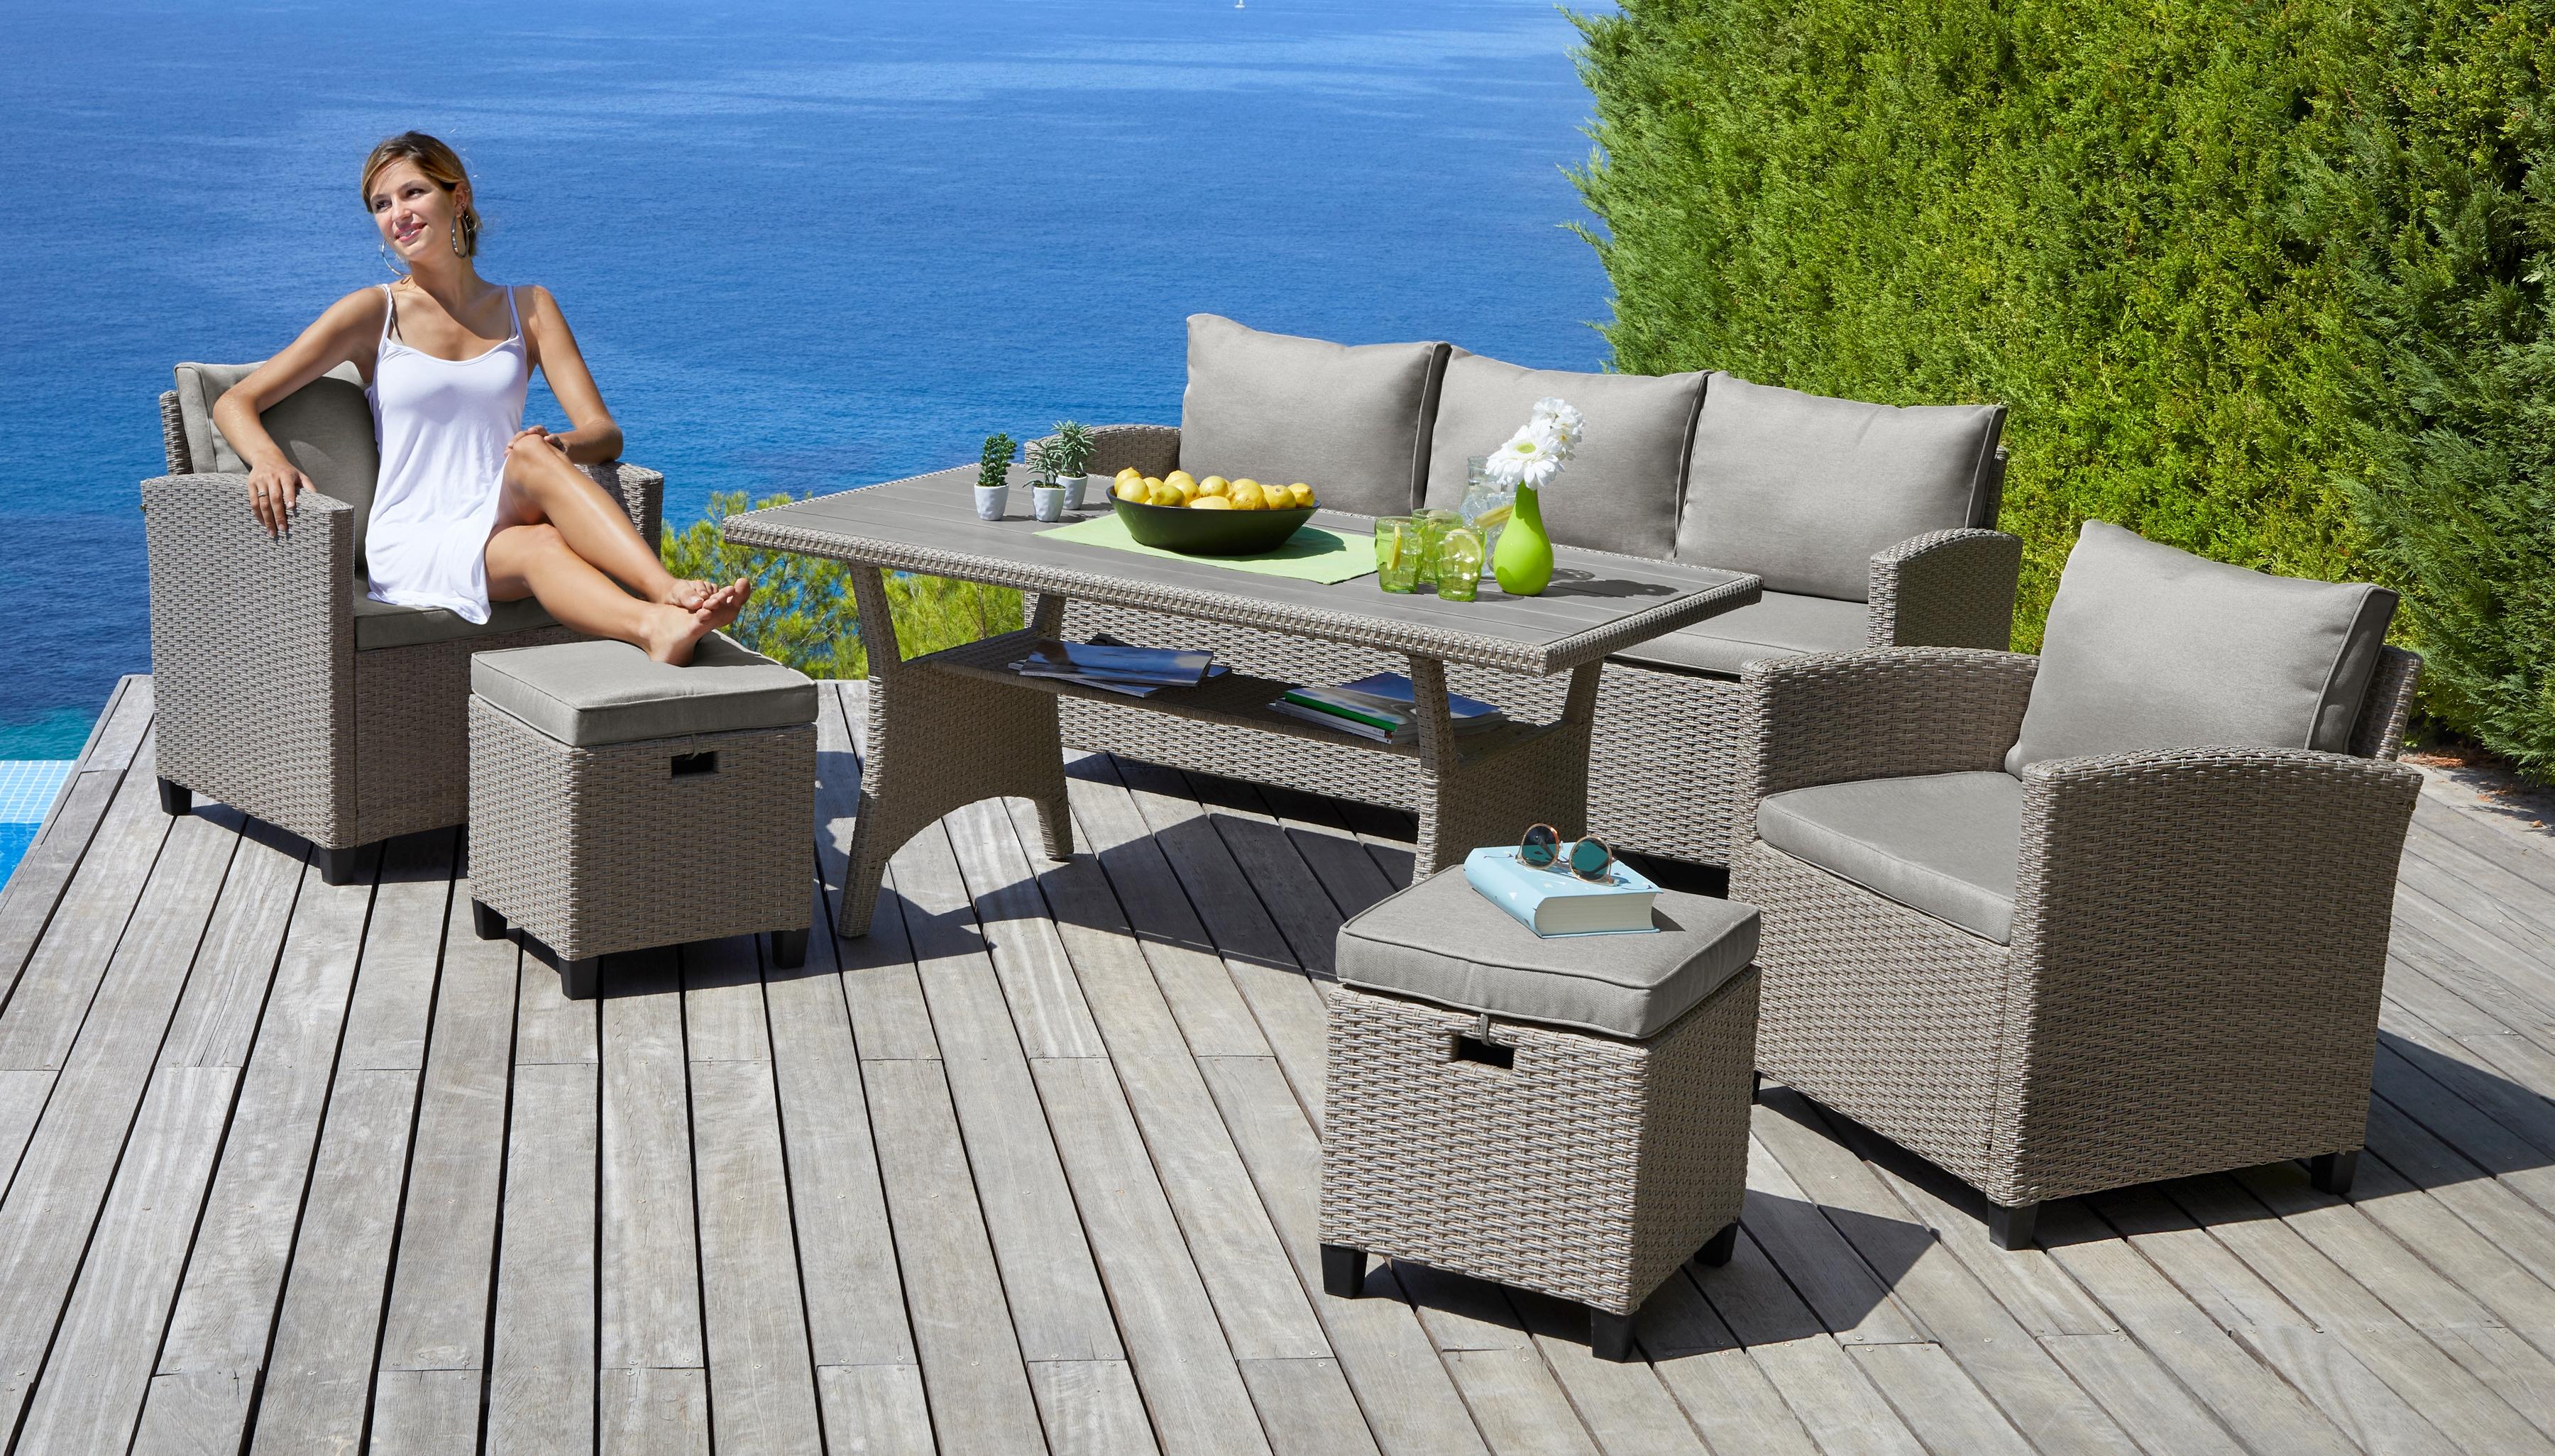 KONIFERA Loungeset Amsterdam 16-tlg 3er Sofa 2 Sessel 2 Hocker Tisch Polyrattan